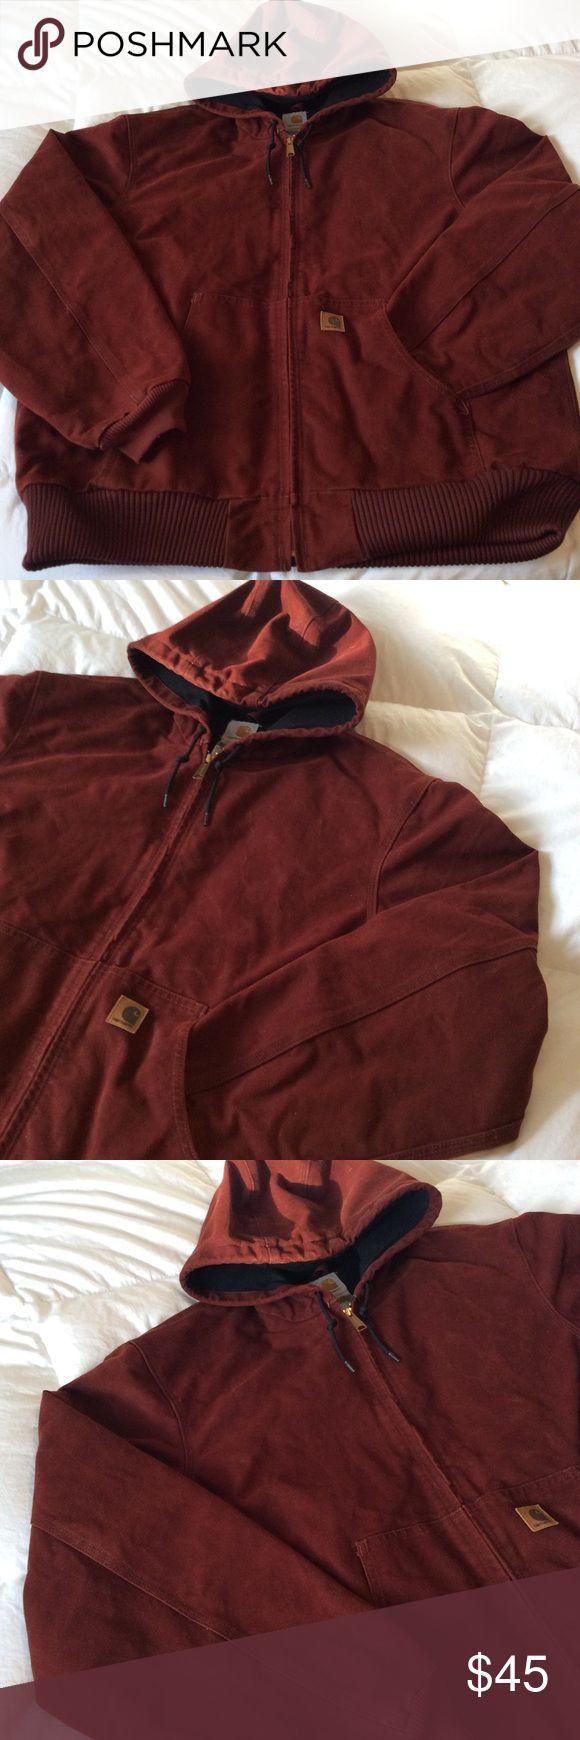 Heavy Duty Hooded Carhartt Coat xL Men's XL thick heavy duty carhartt coat. Front pockets and a pocket inside. The zipper works but is a bit stubborn. Brick red burnt orange color. Carhartt Jackets & Coats